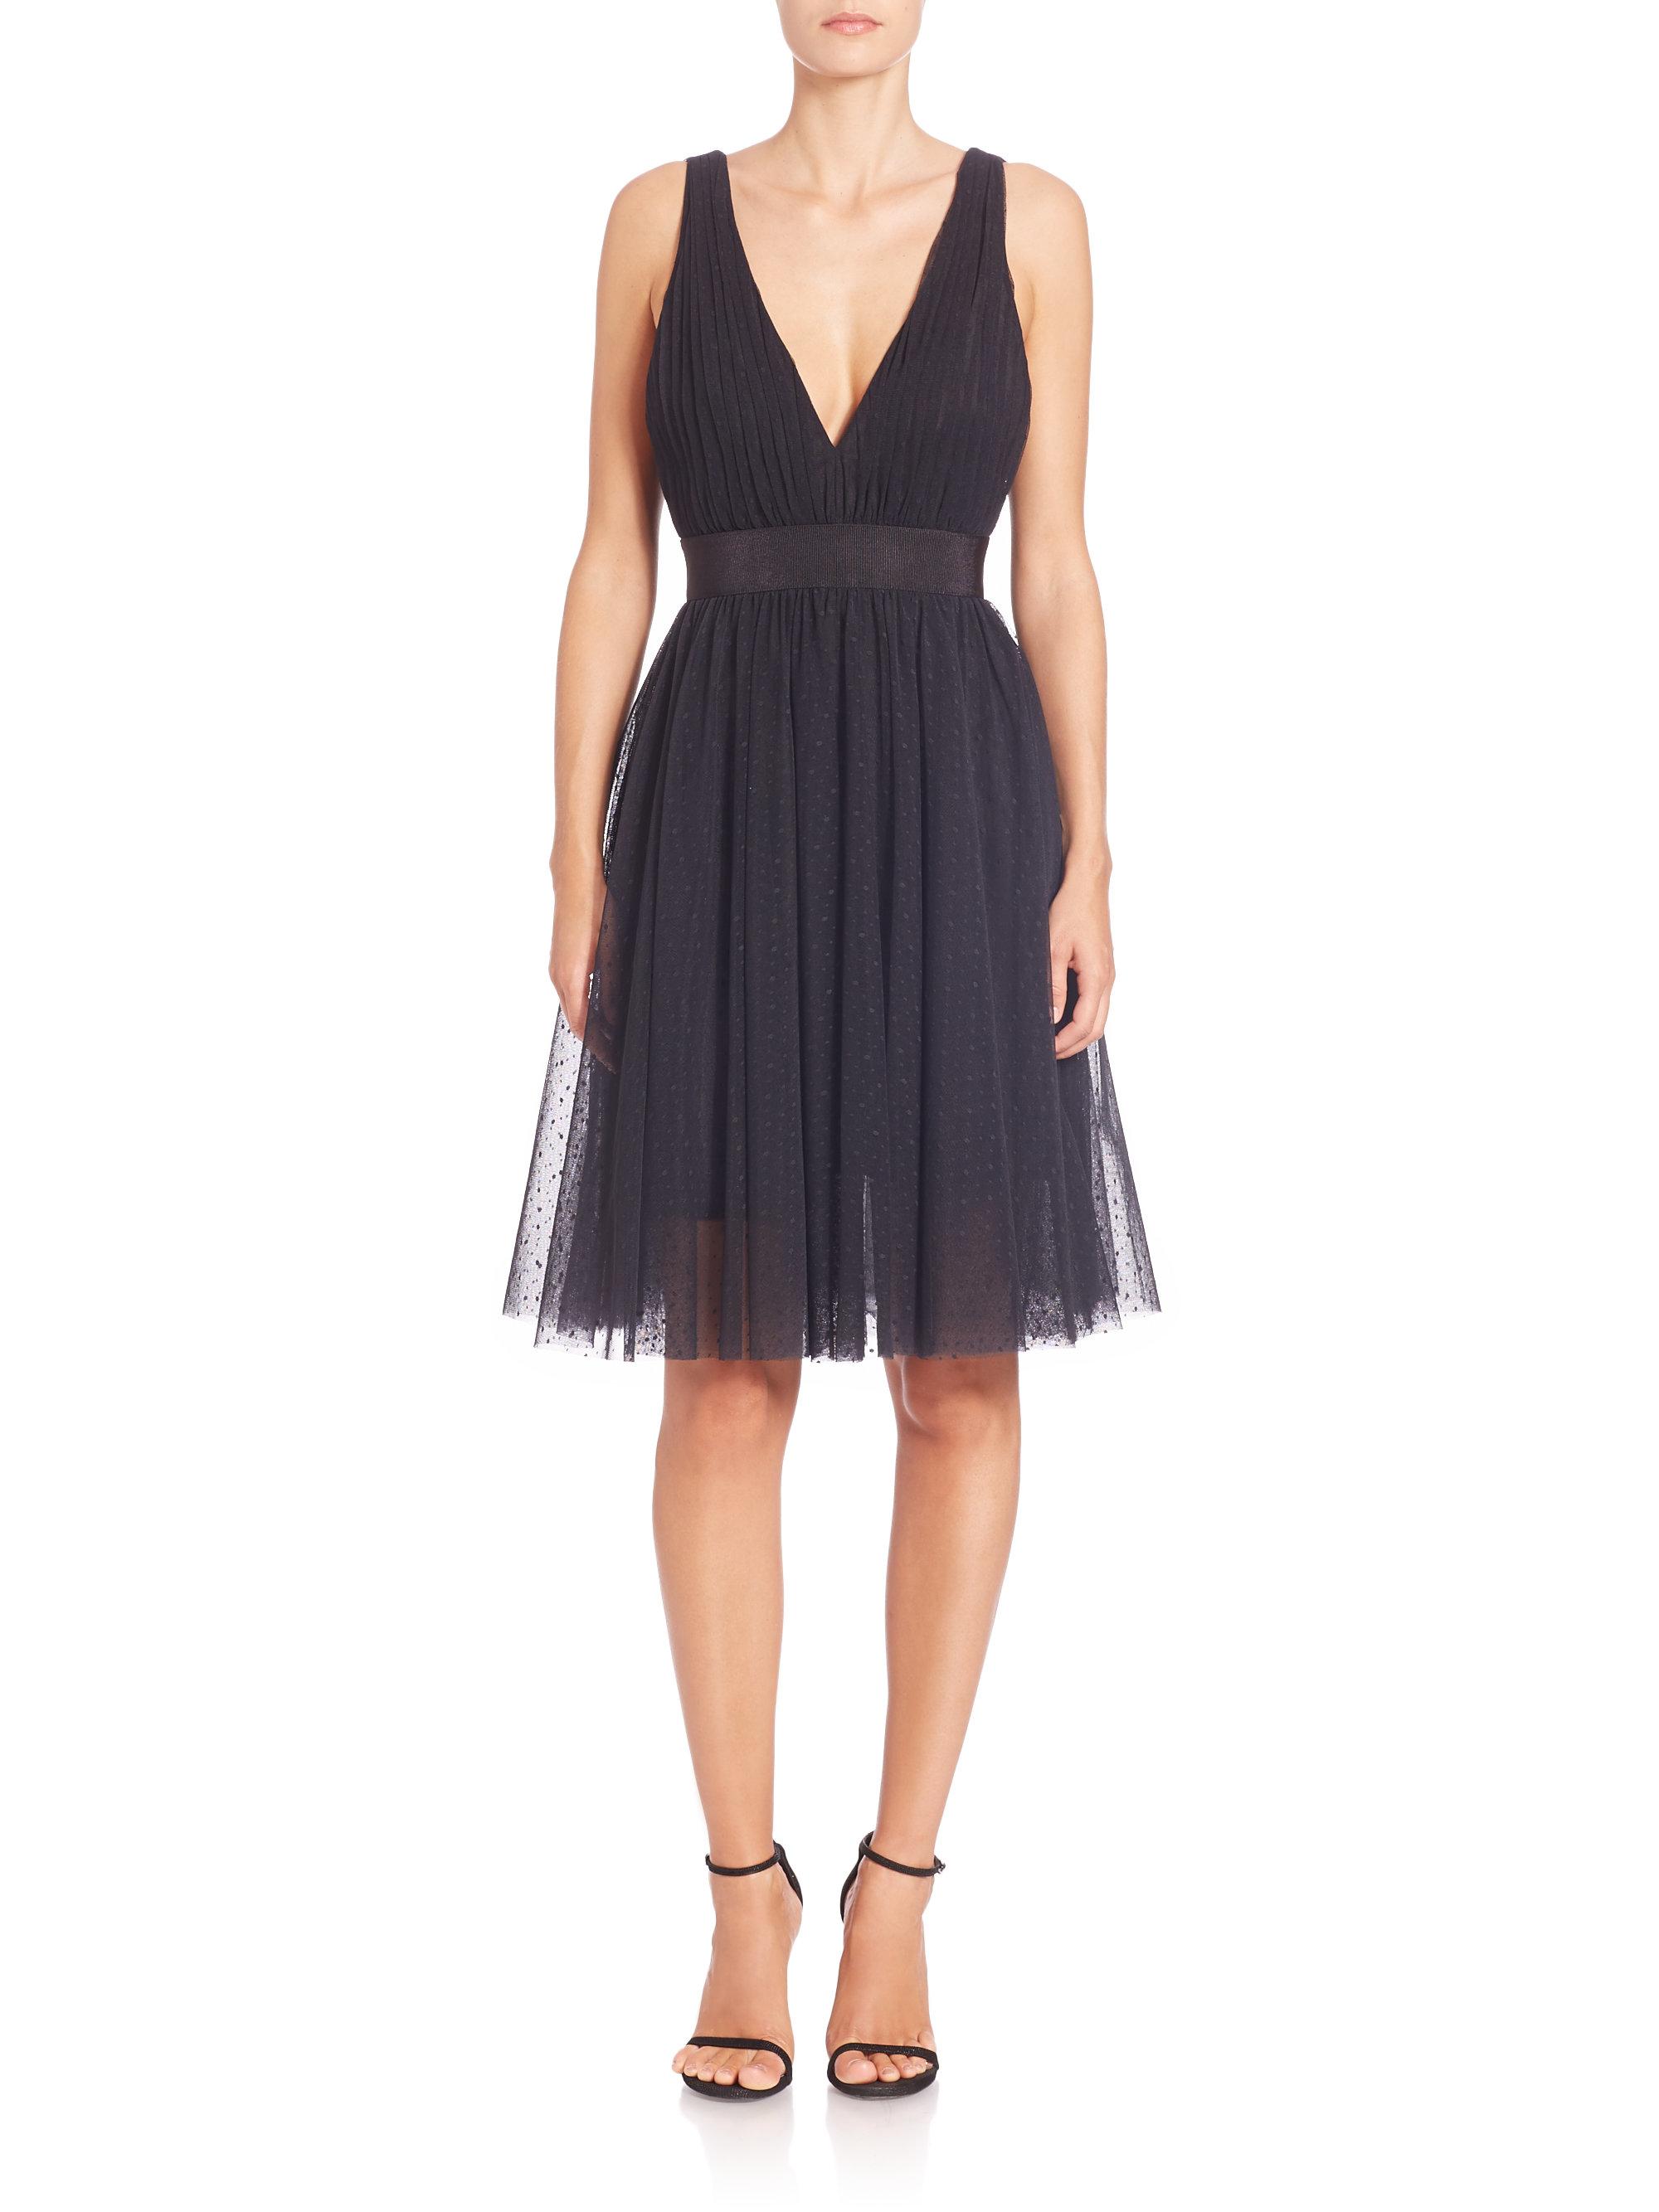 Lyst - Abs By Allen Schwartz Tulle Fit-&-flare Cocktail Dress in Black